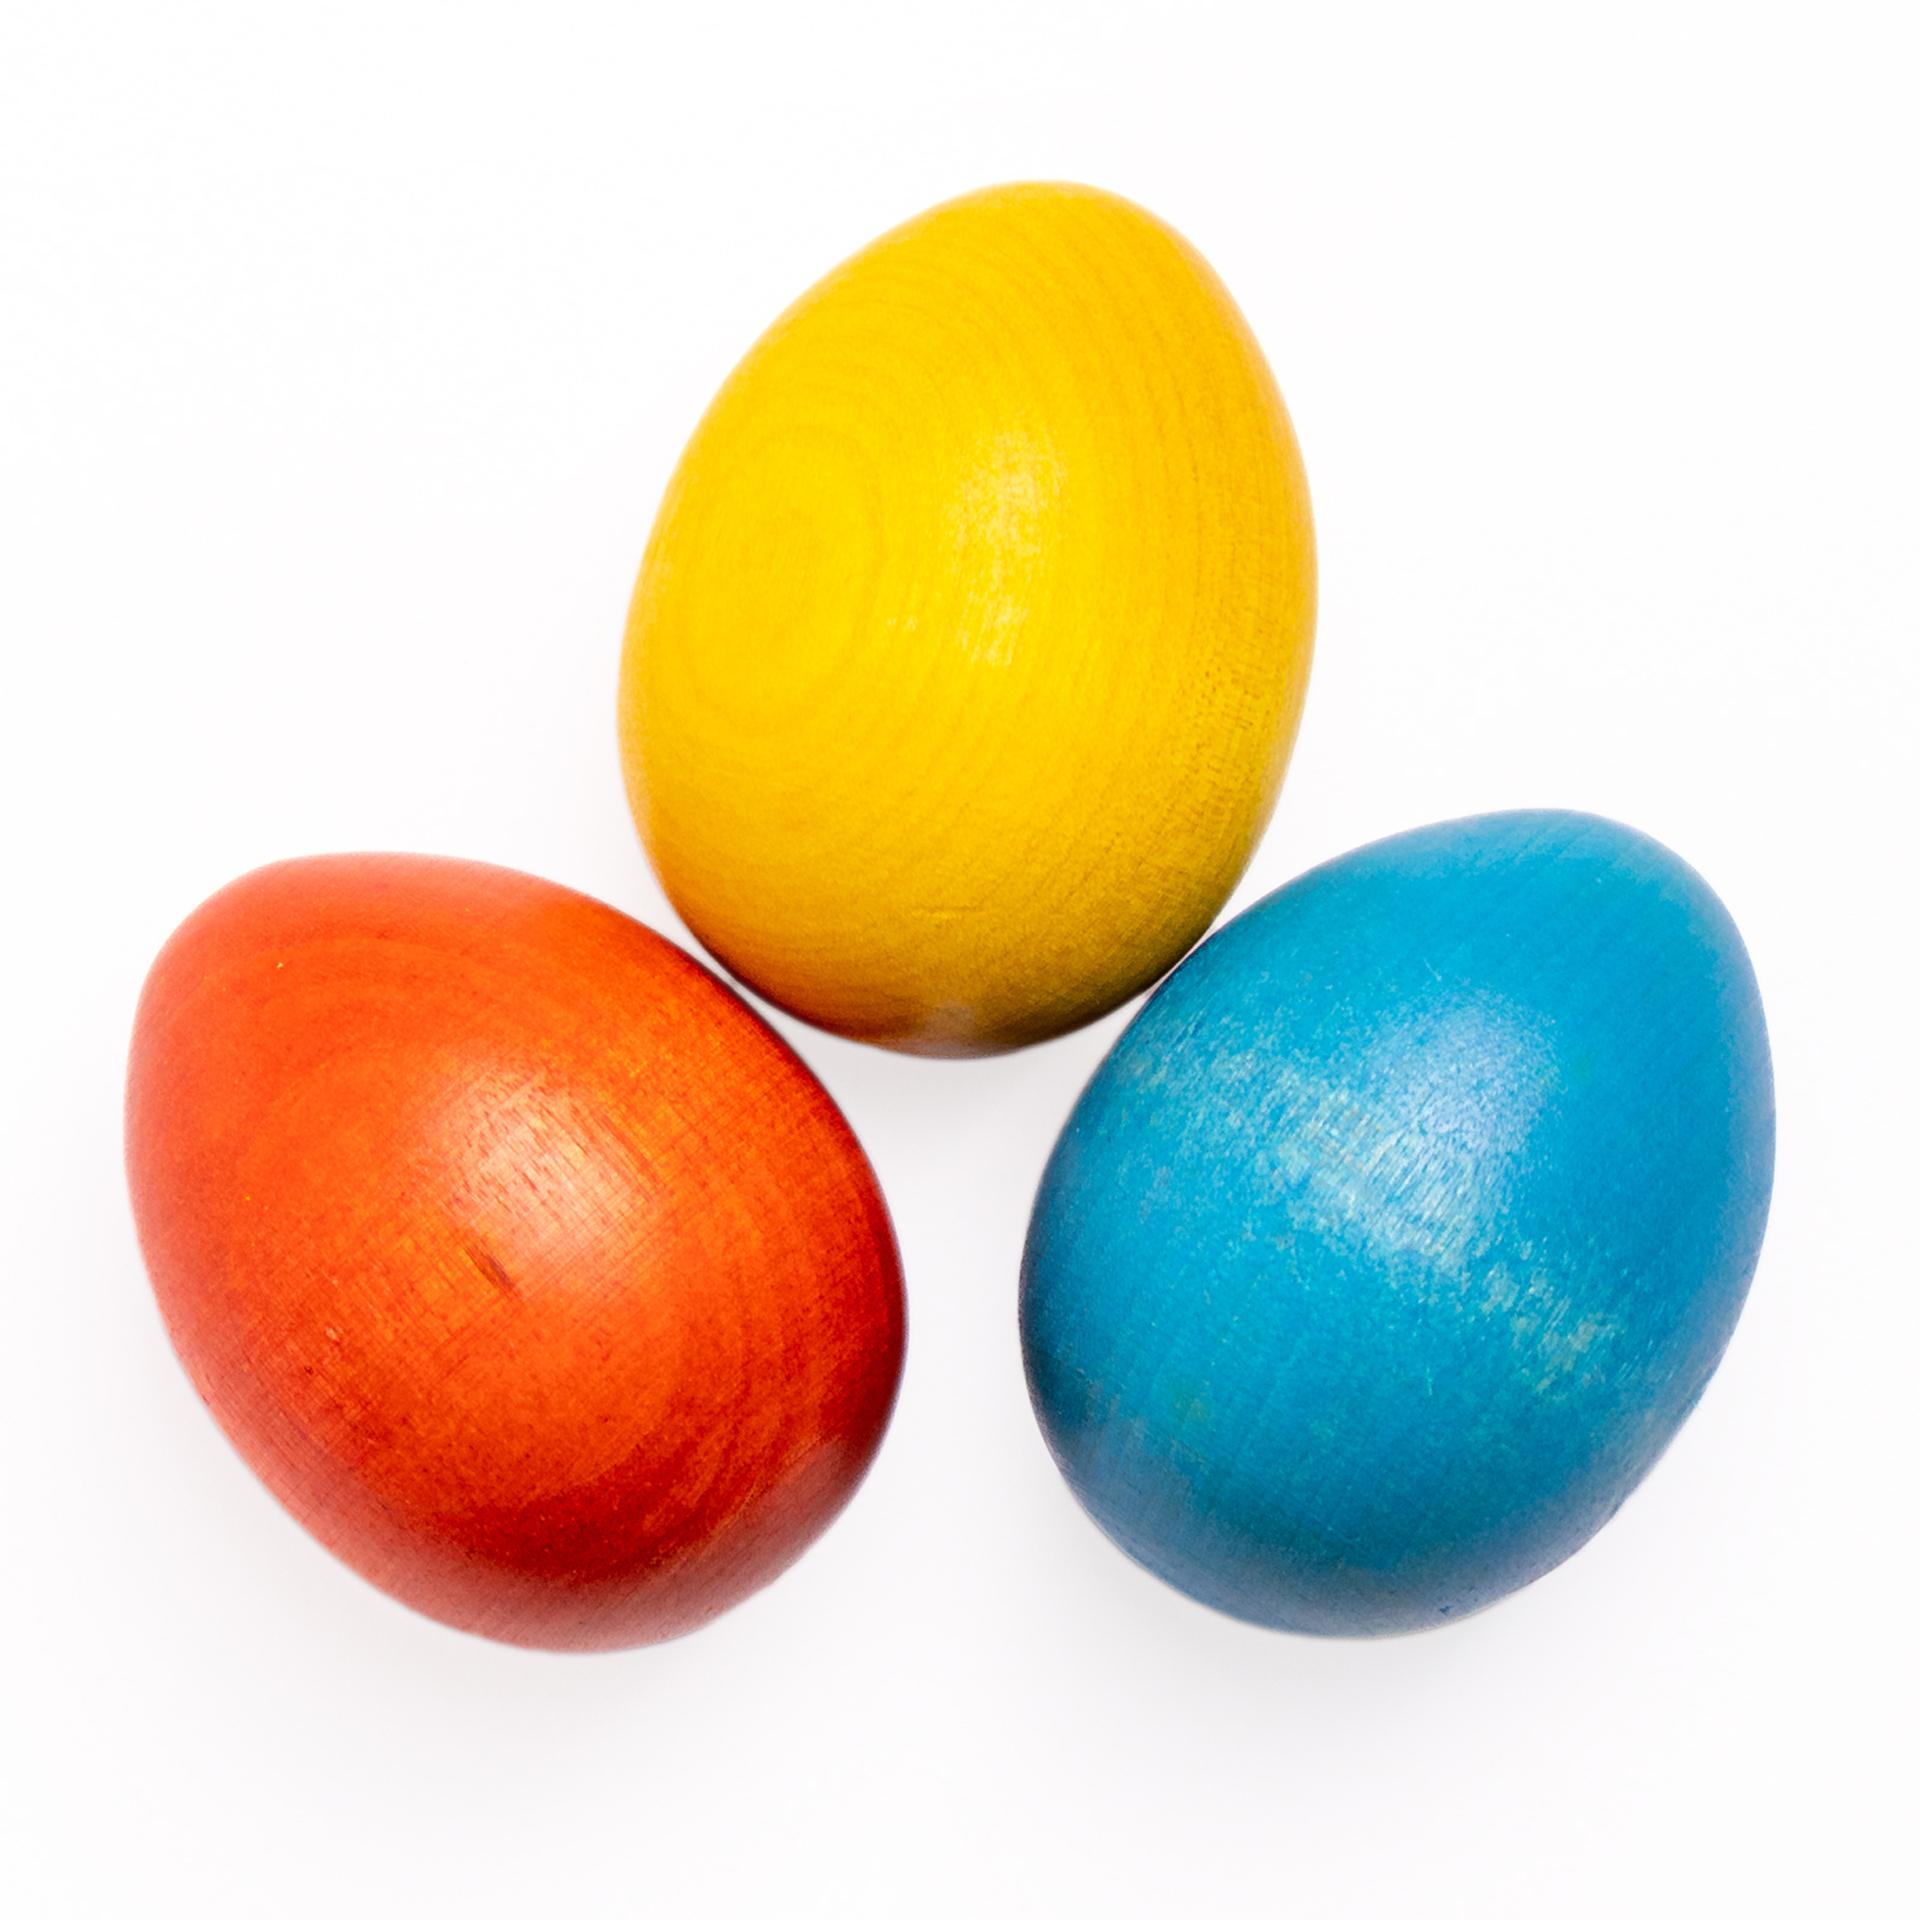 Osterei, 3er Set (blau, orange, gelb)